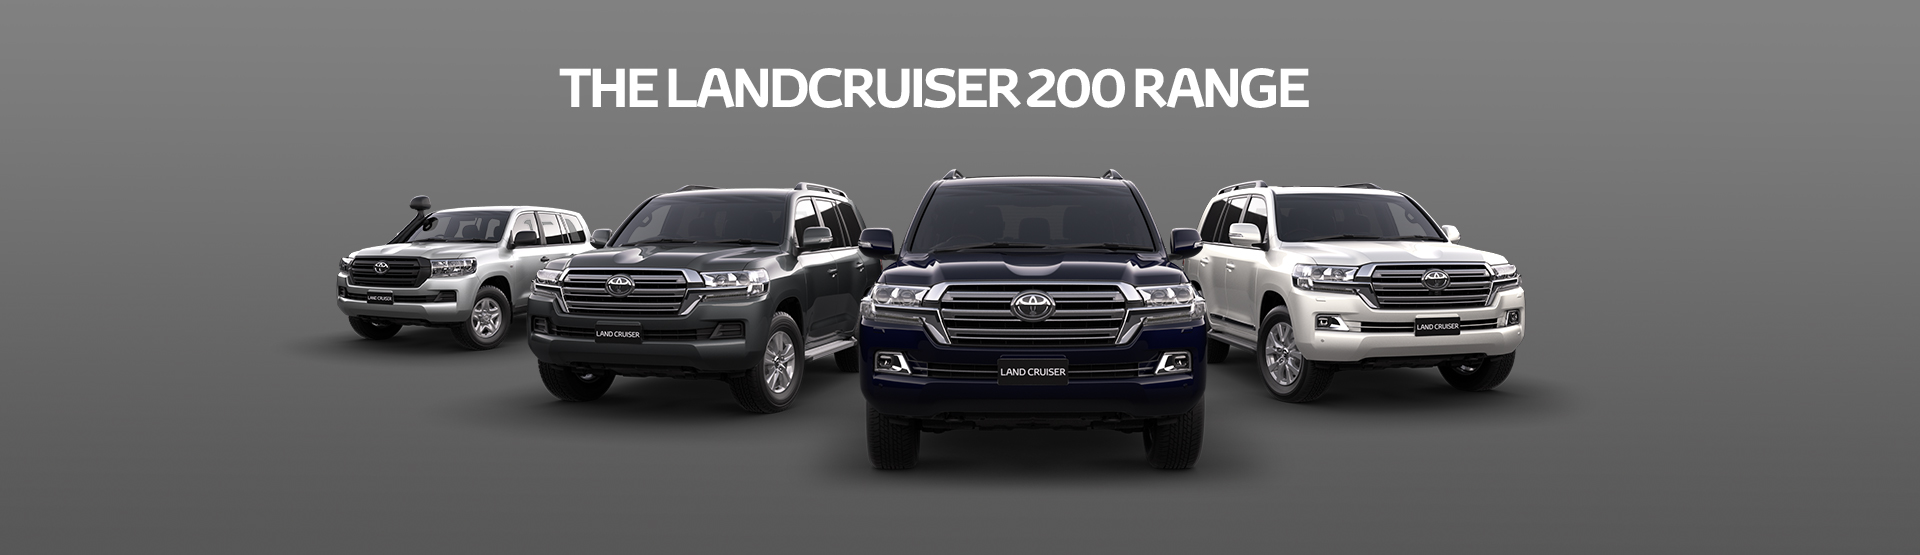 LandCruiser 200